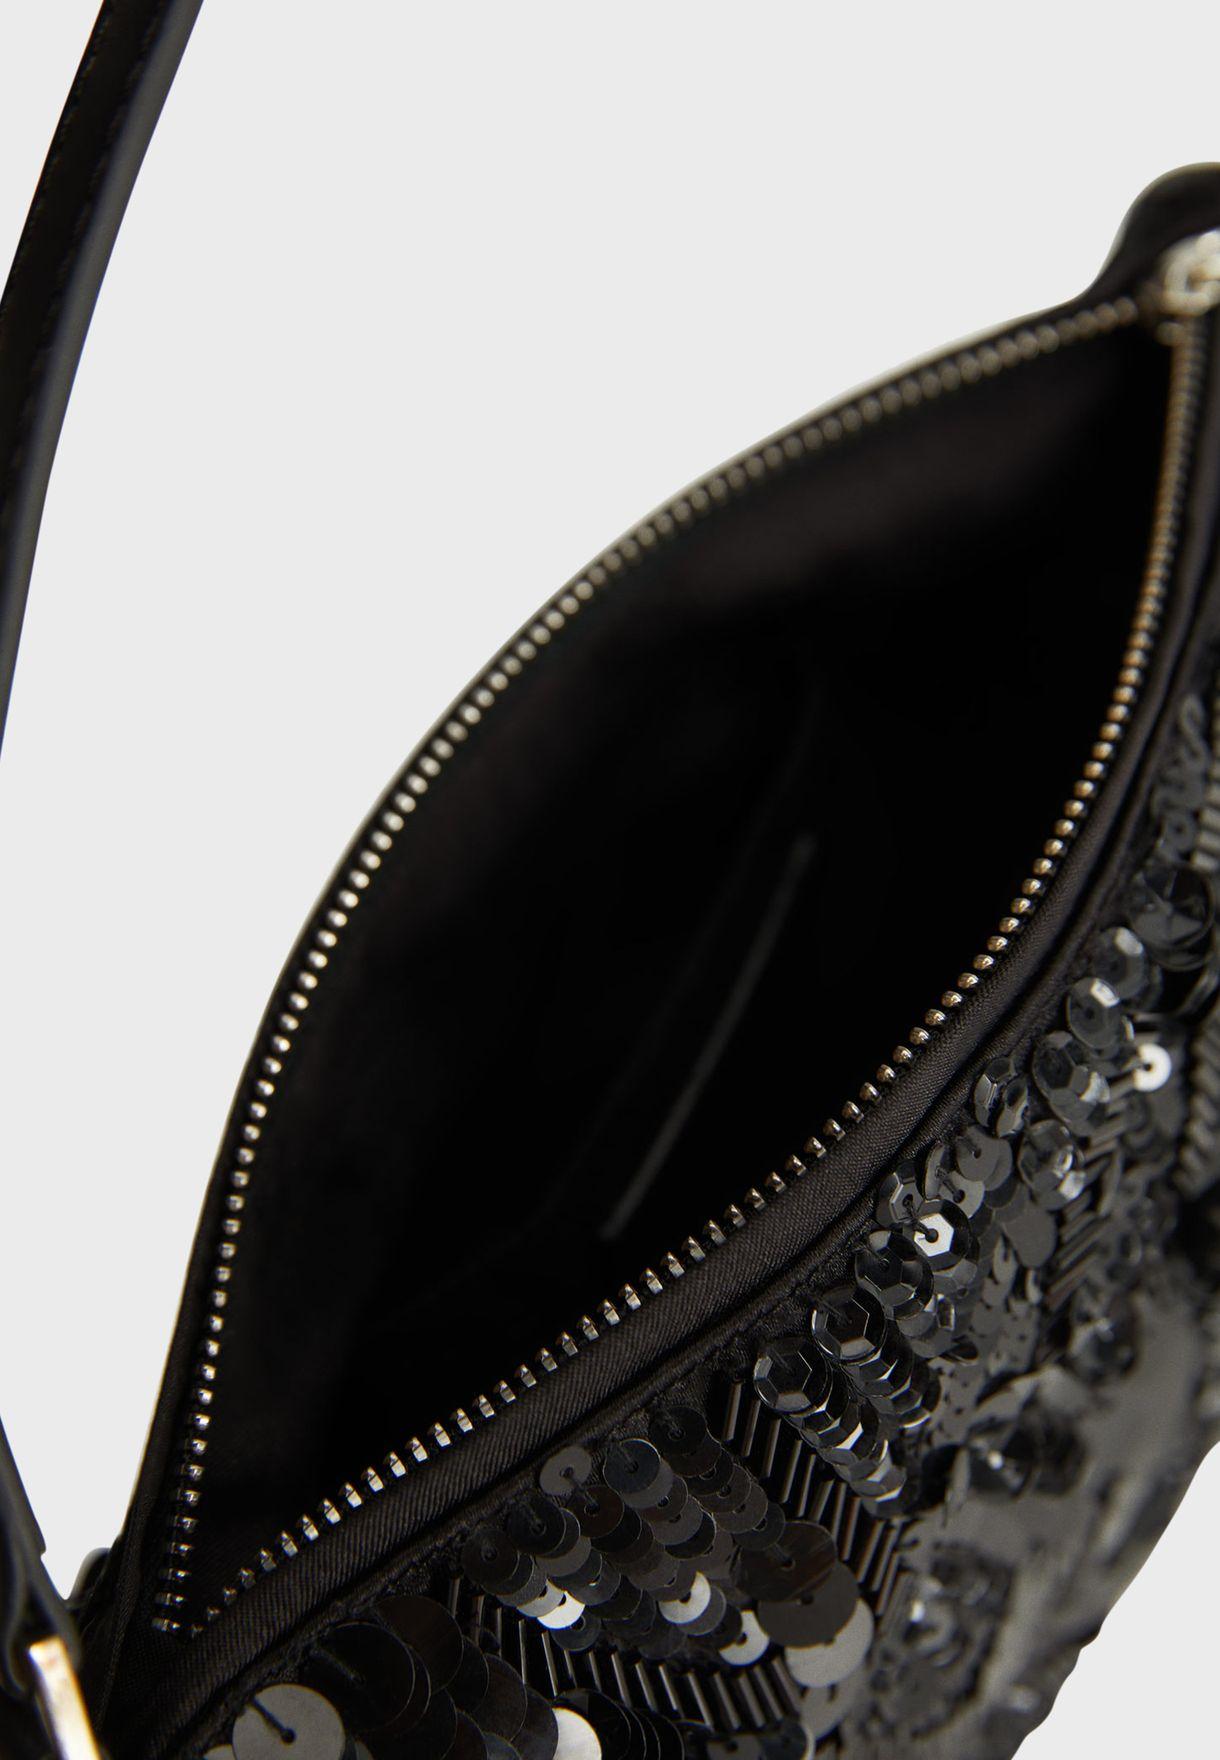 Classy Sequins Baguette Crossbody